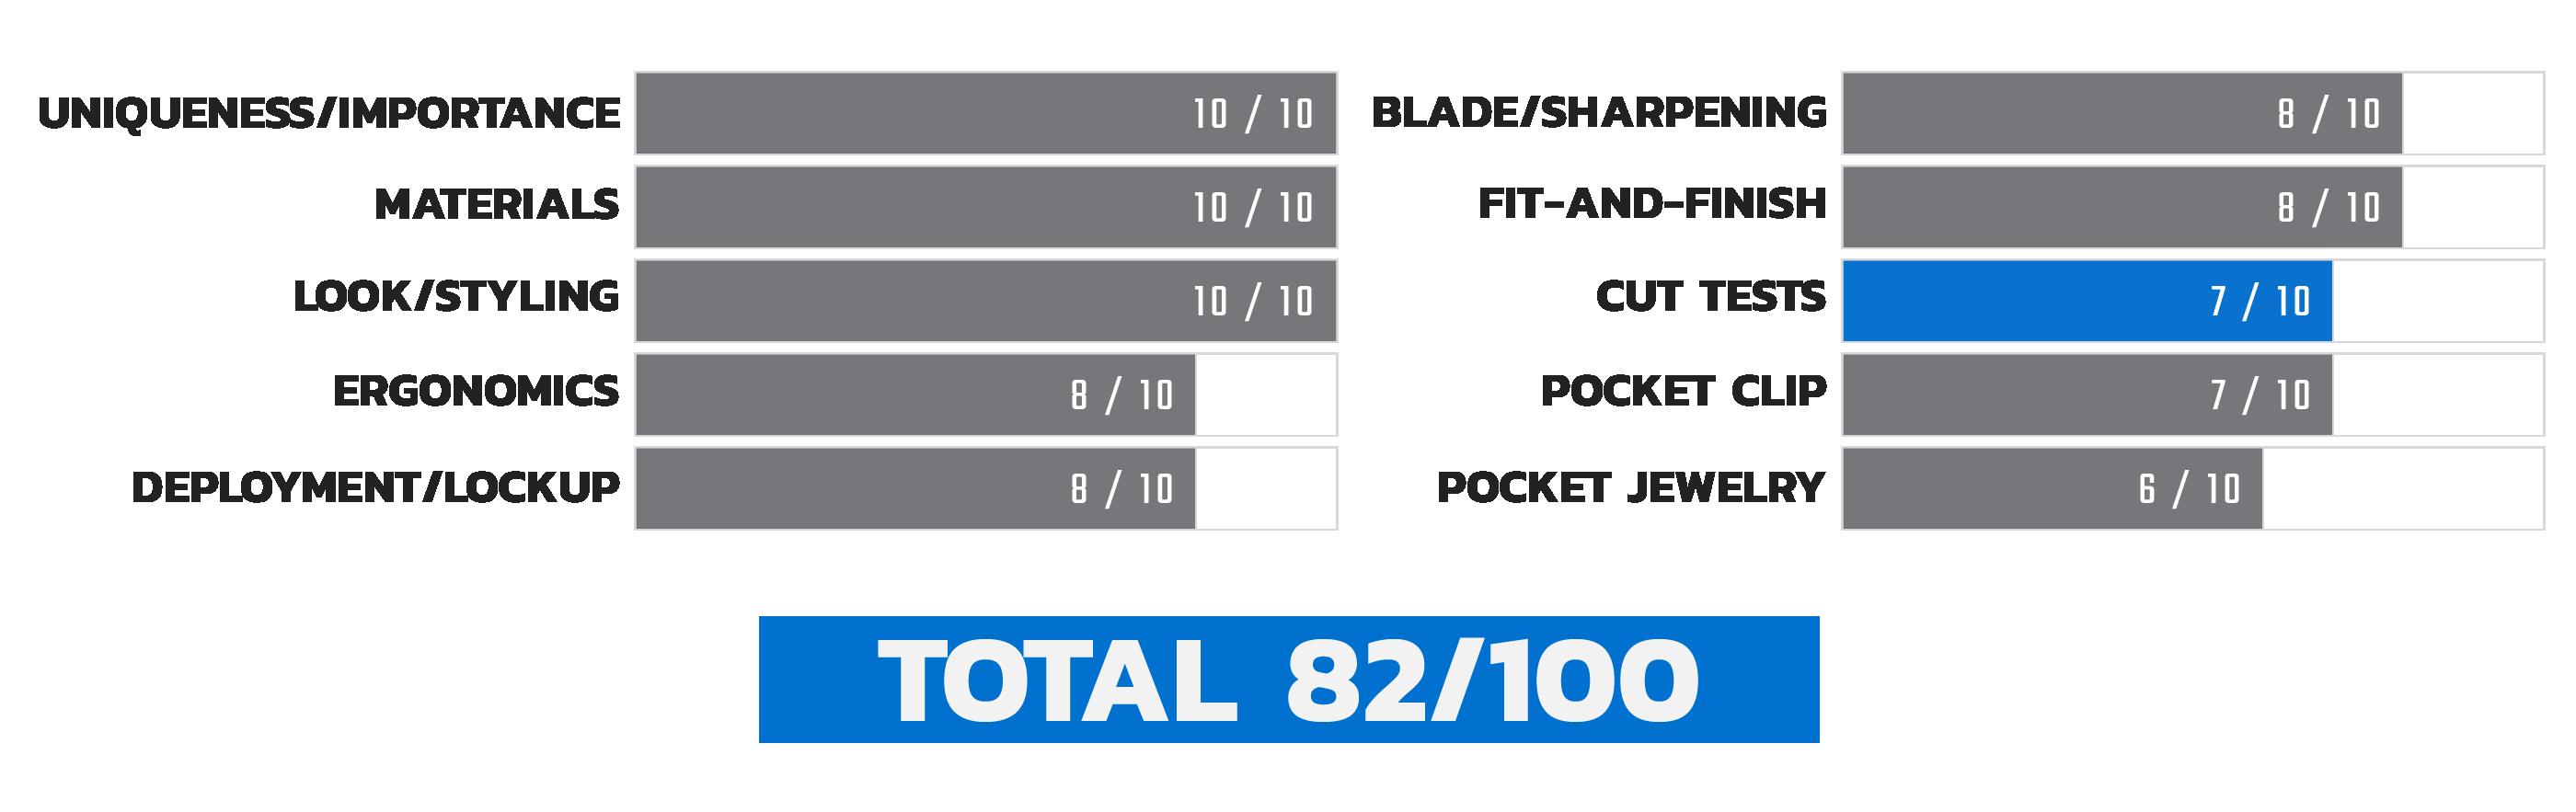 Launch 4 Cut Test Score Chart